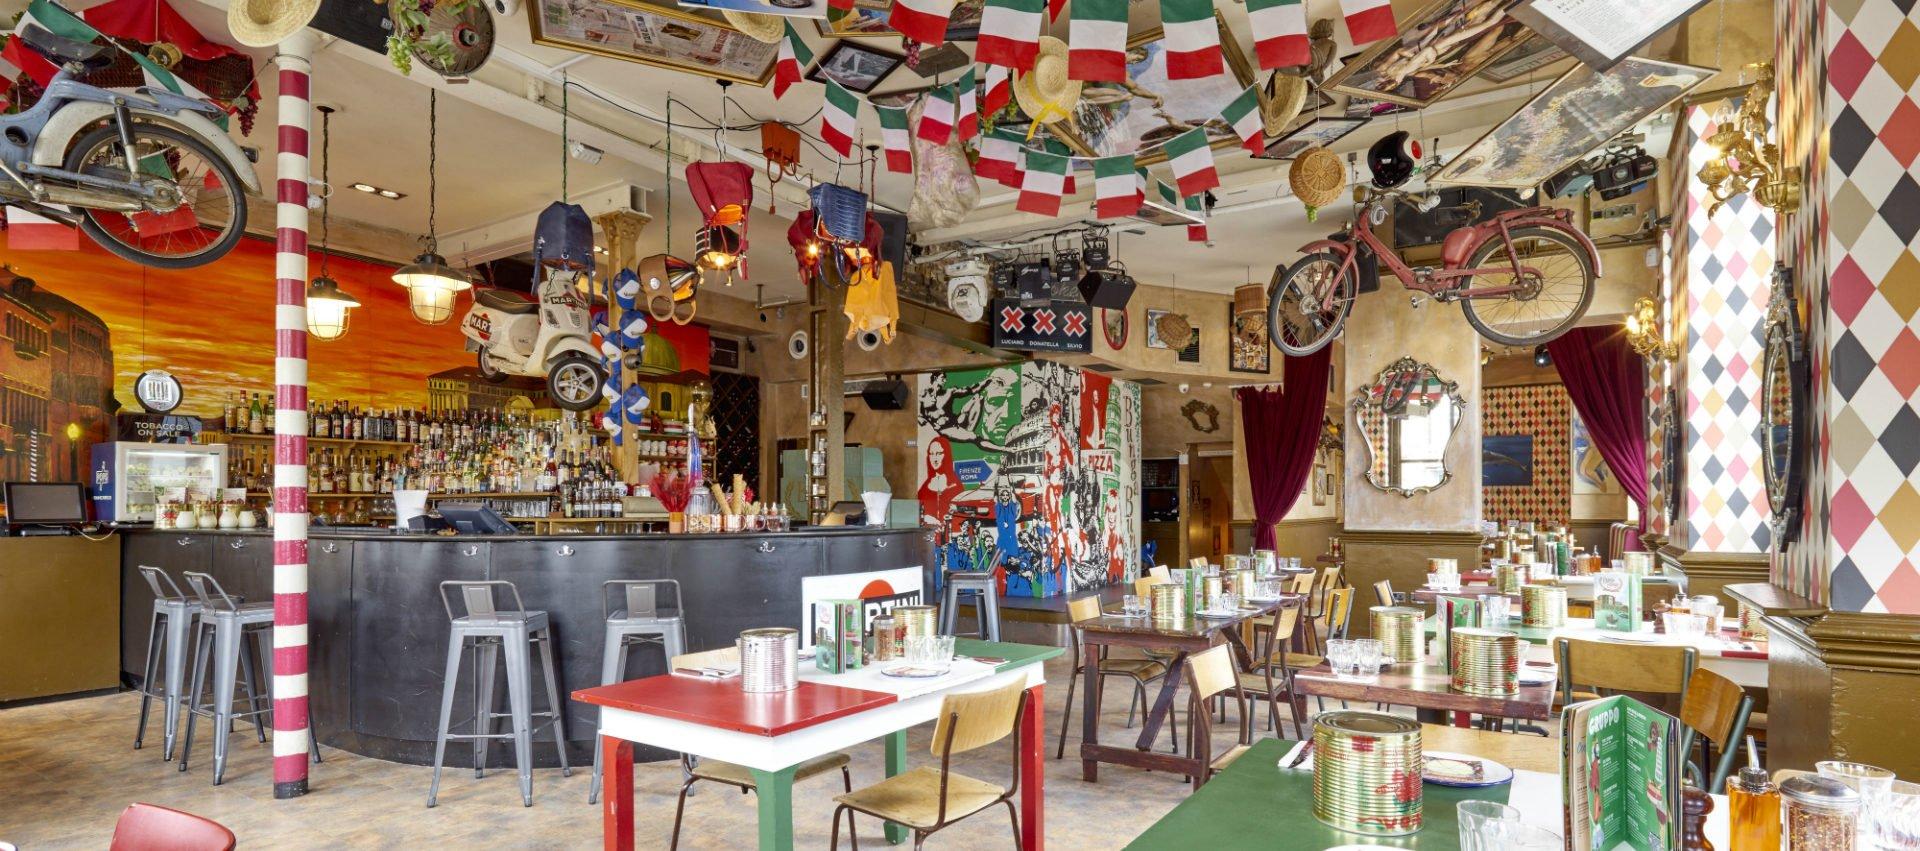 Best Italian Restaurant In Battersea